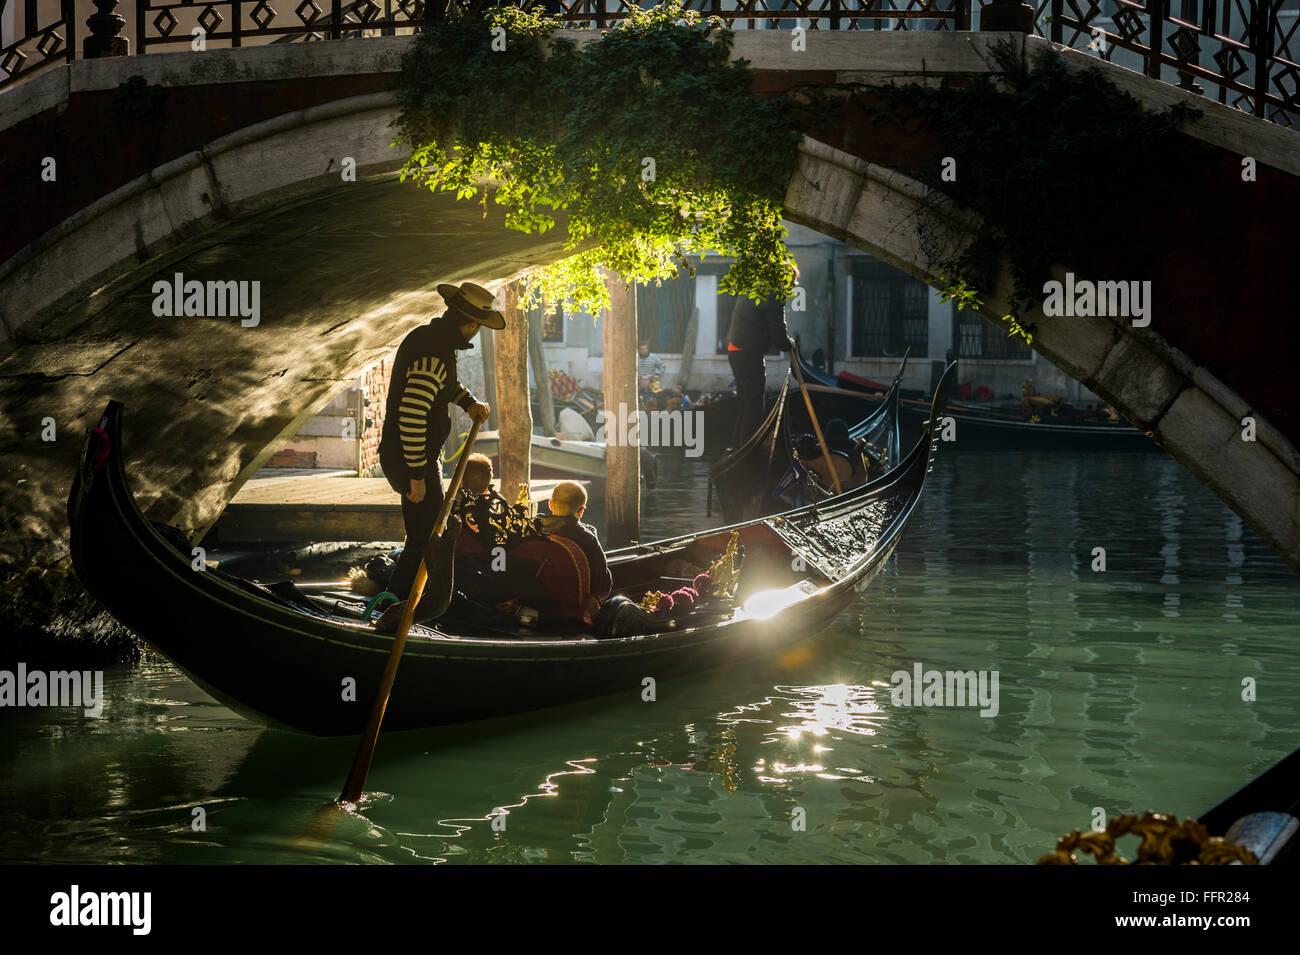 Canal, gondola with gondolier travels under a bridge, Venice, Veneto, Italy - Stock Image